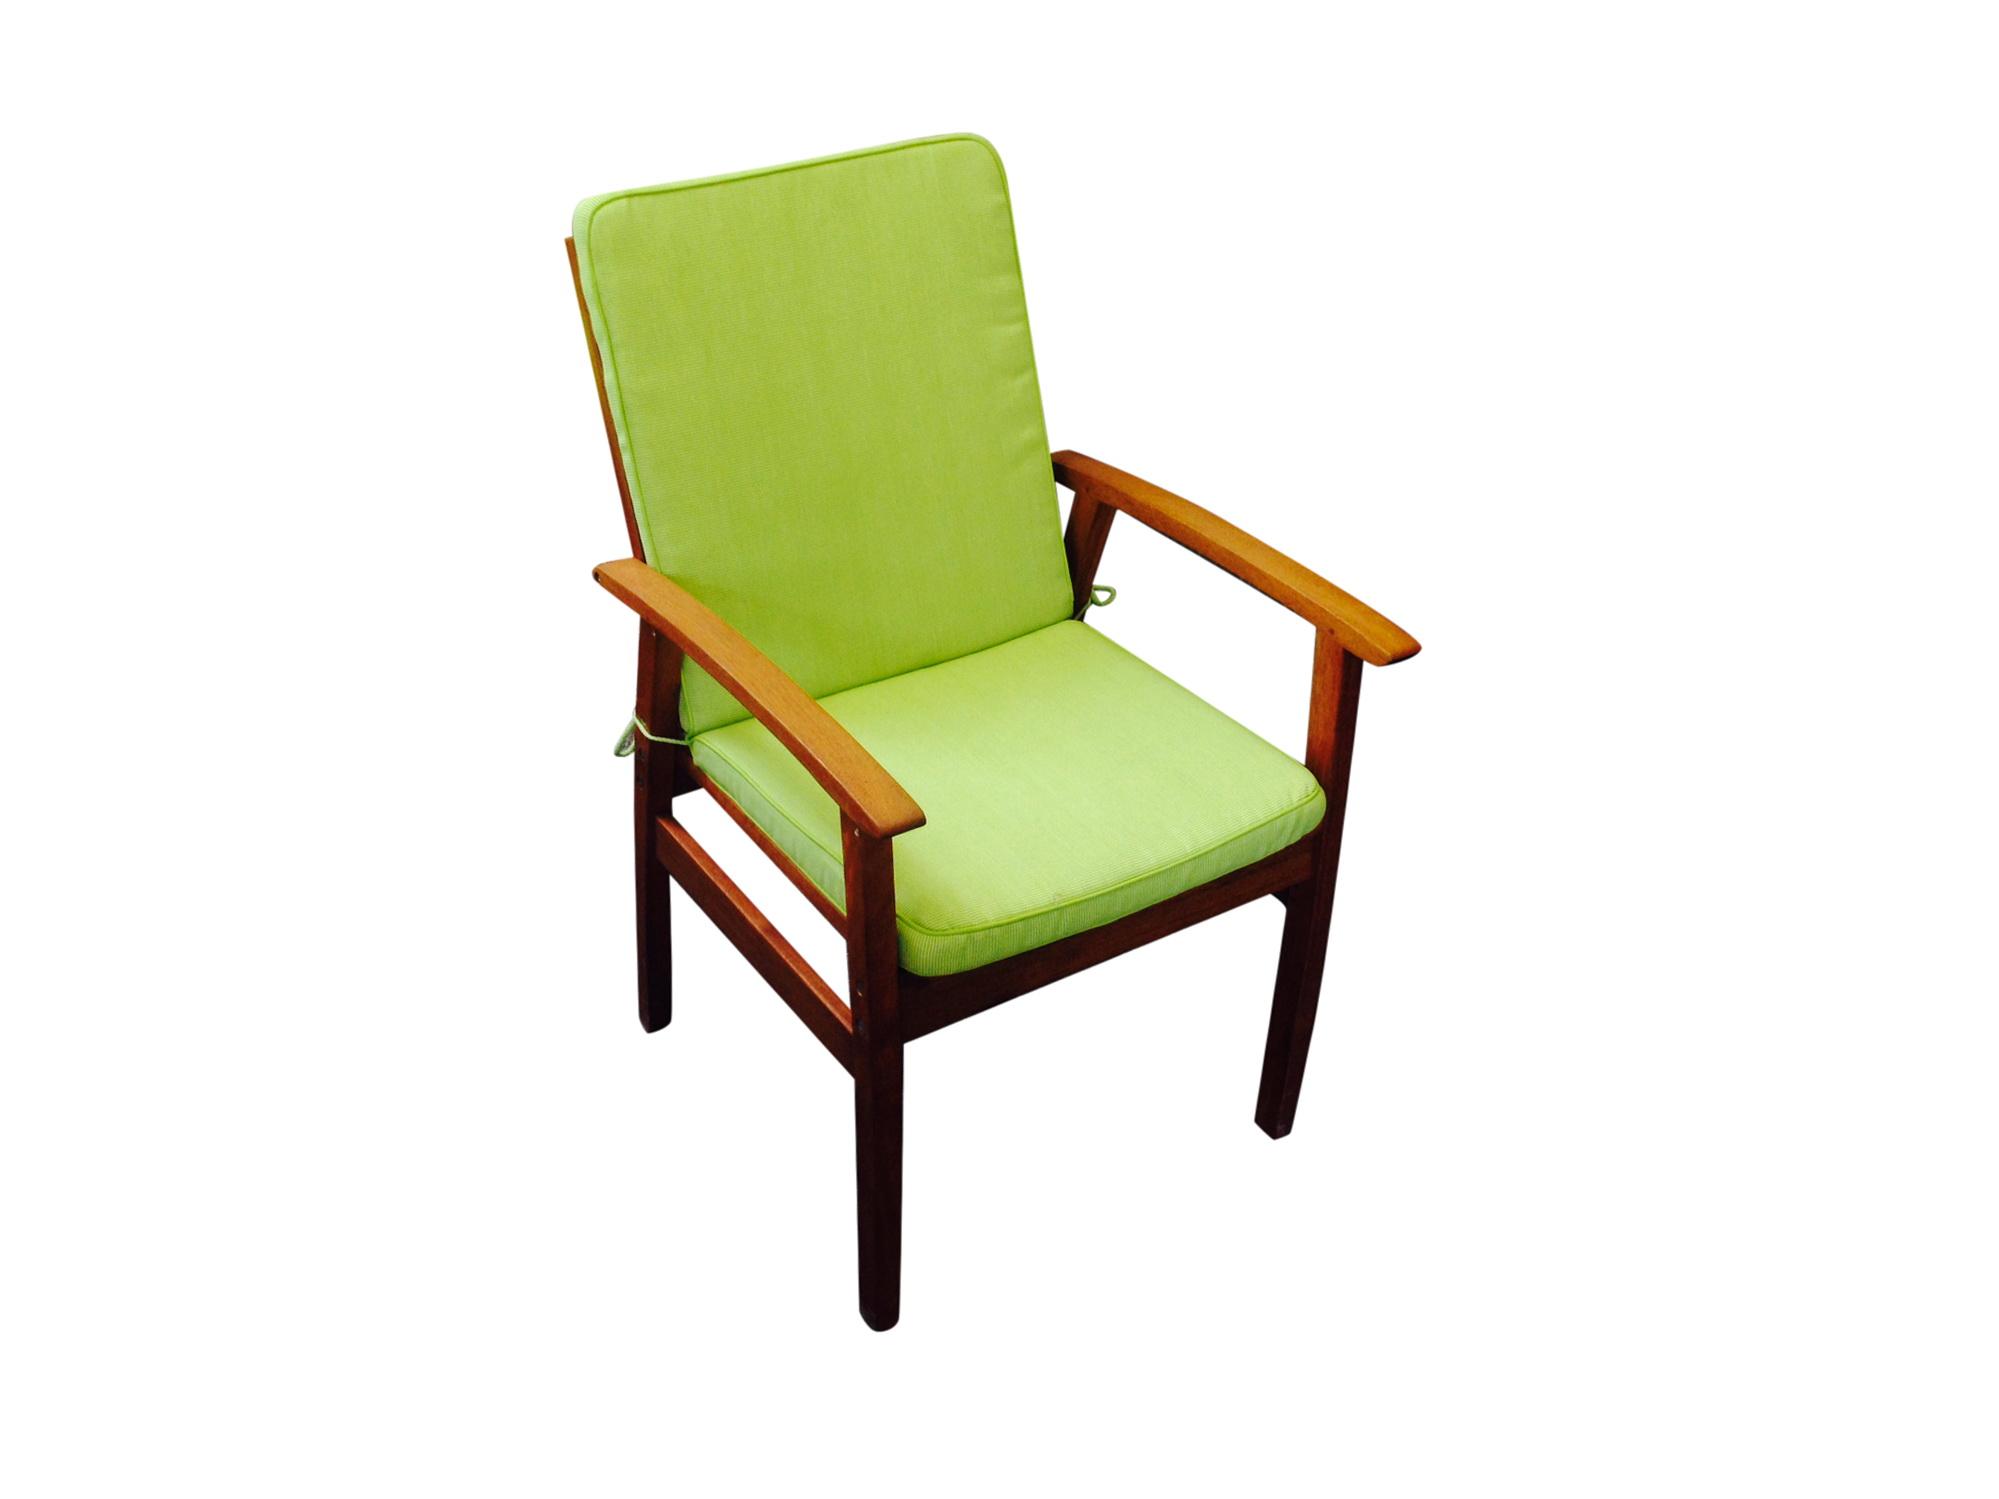 Outdoor Bench Seat Cushions Australia Home Design Ideas